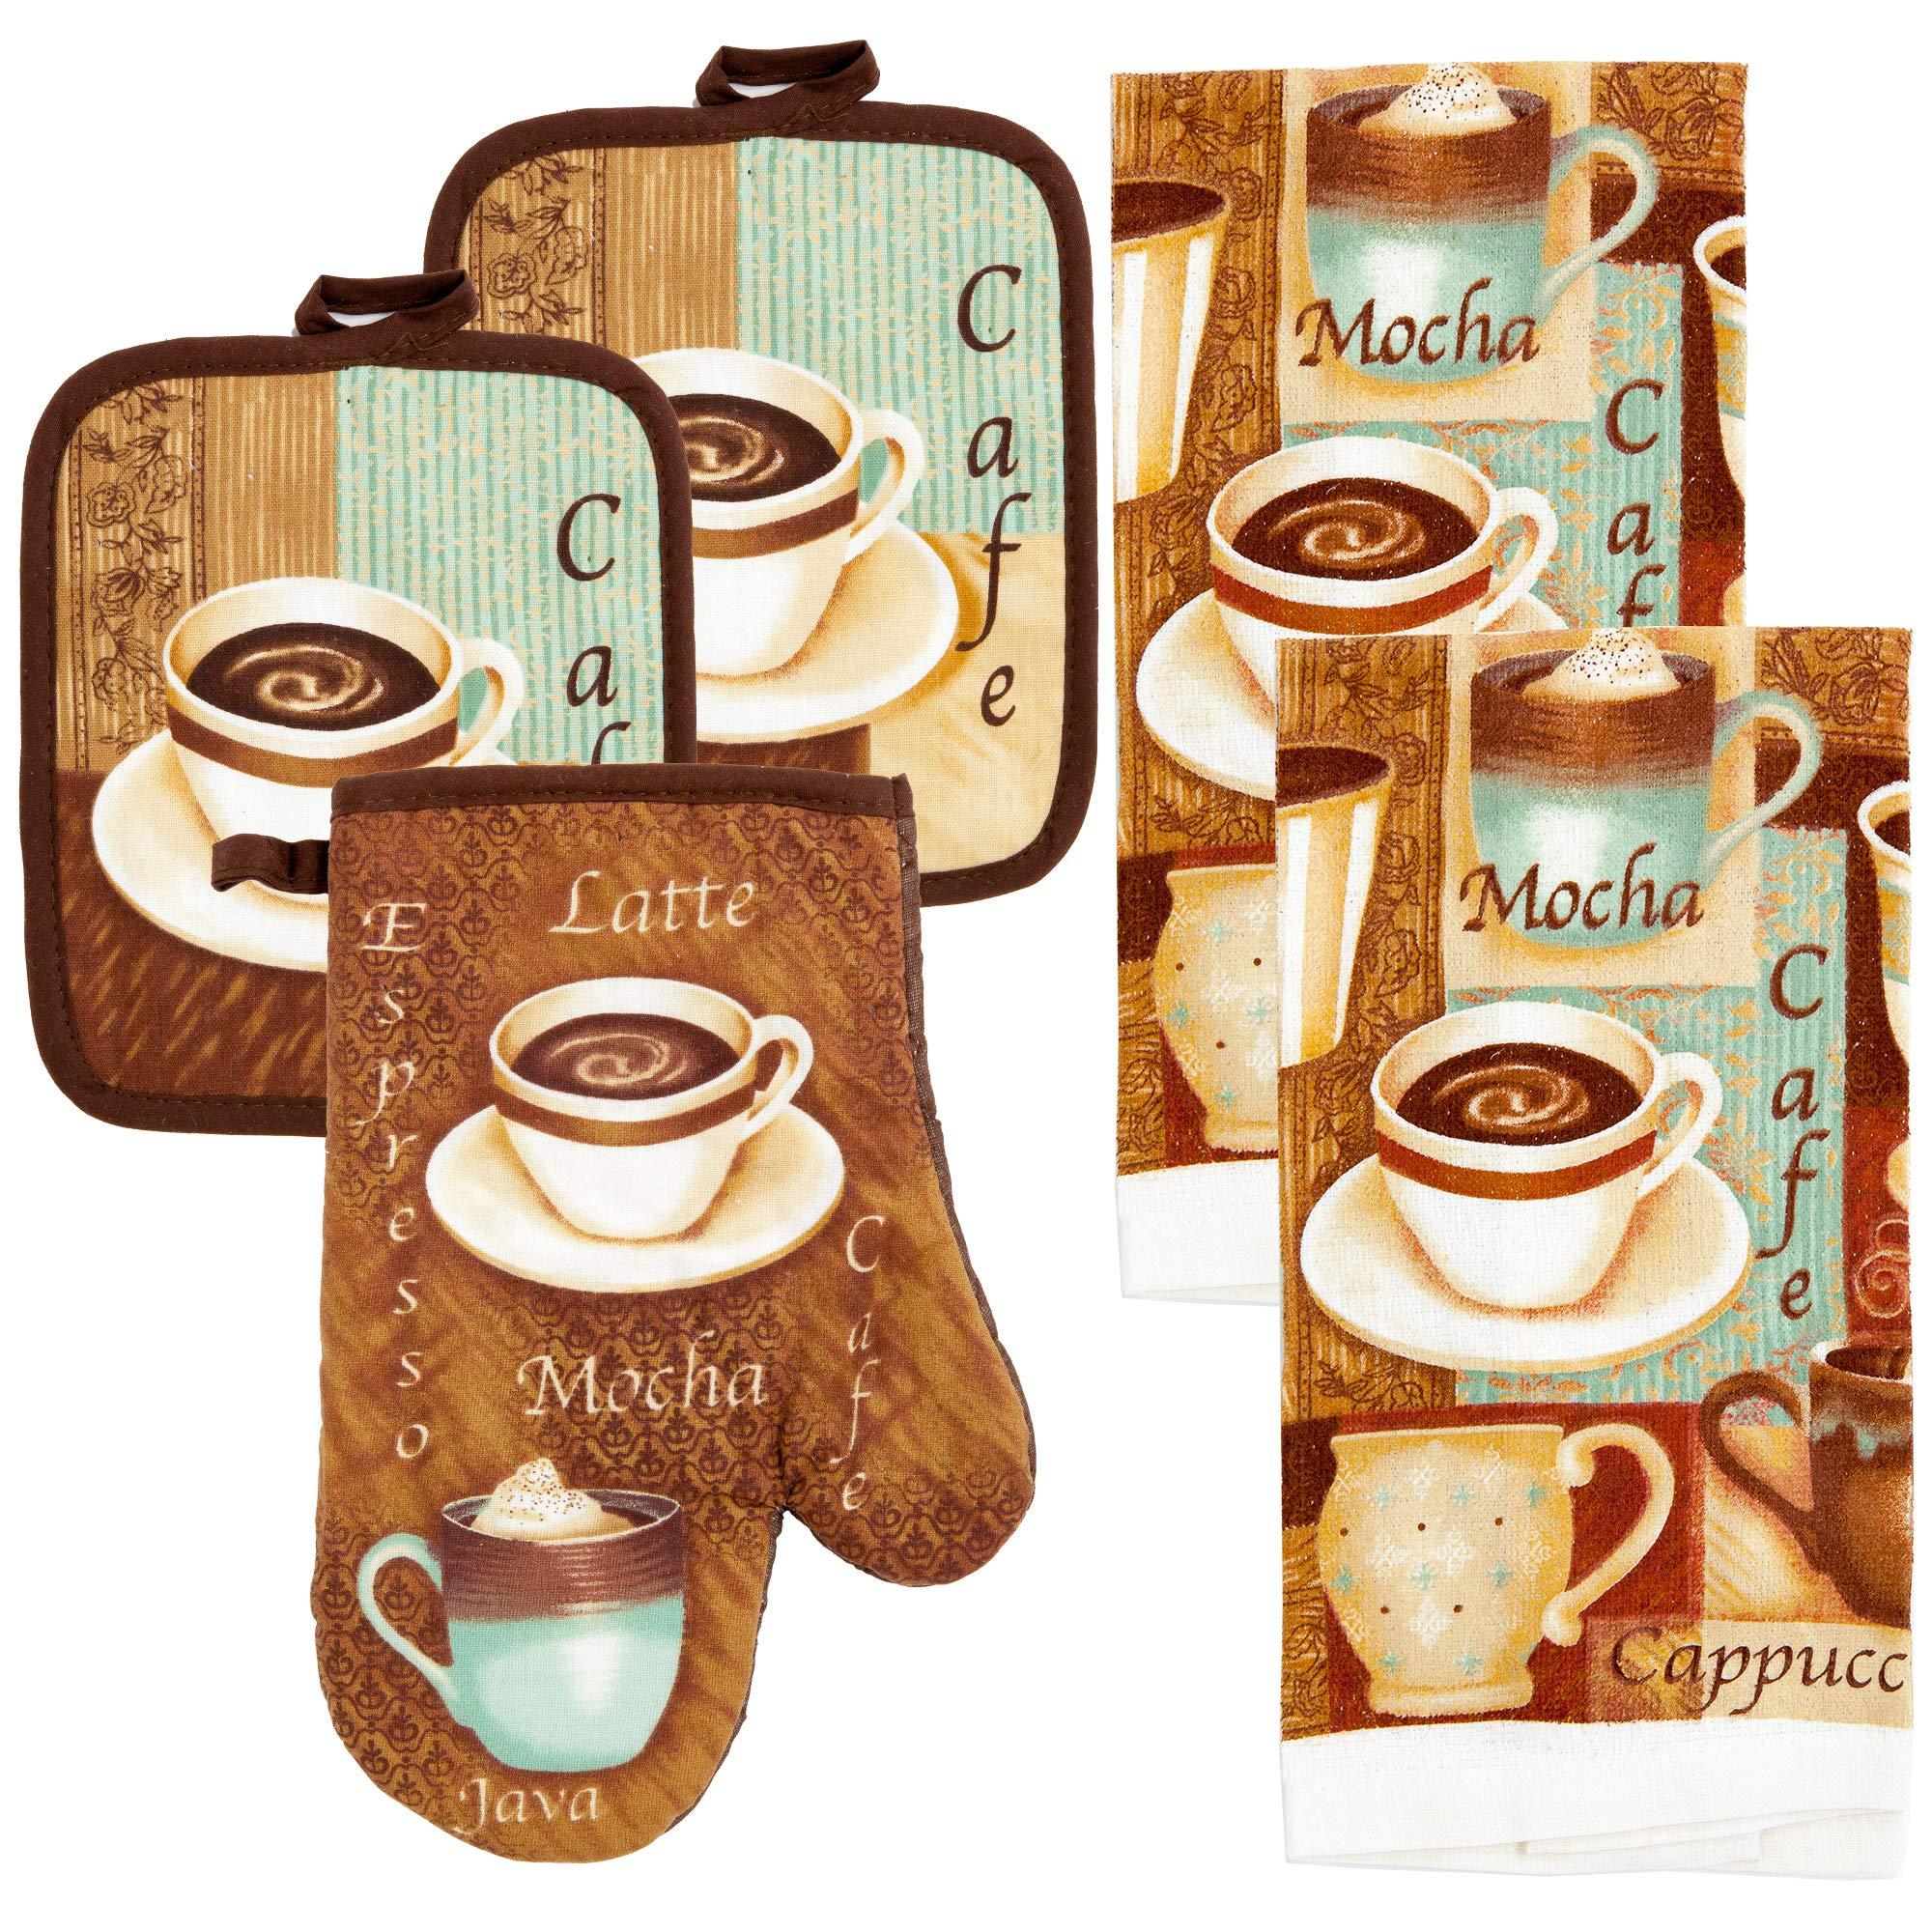 MJM Innovations Kitchen Towel Linen Set of 5 Pieces   2 Kitchen Towels 2 Potholders & 1 Oven Mitten (Java Cafe)